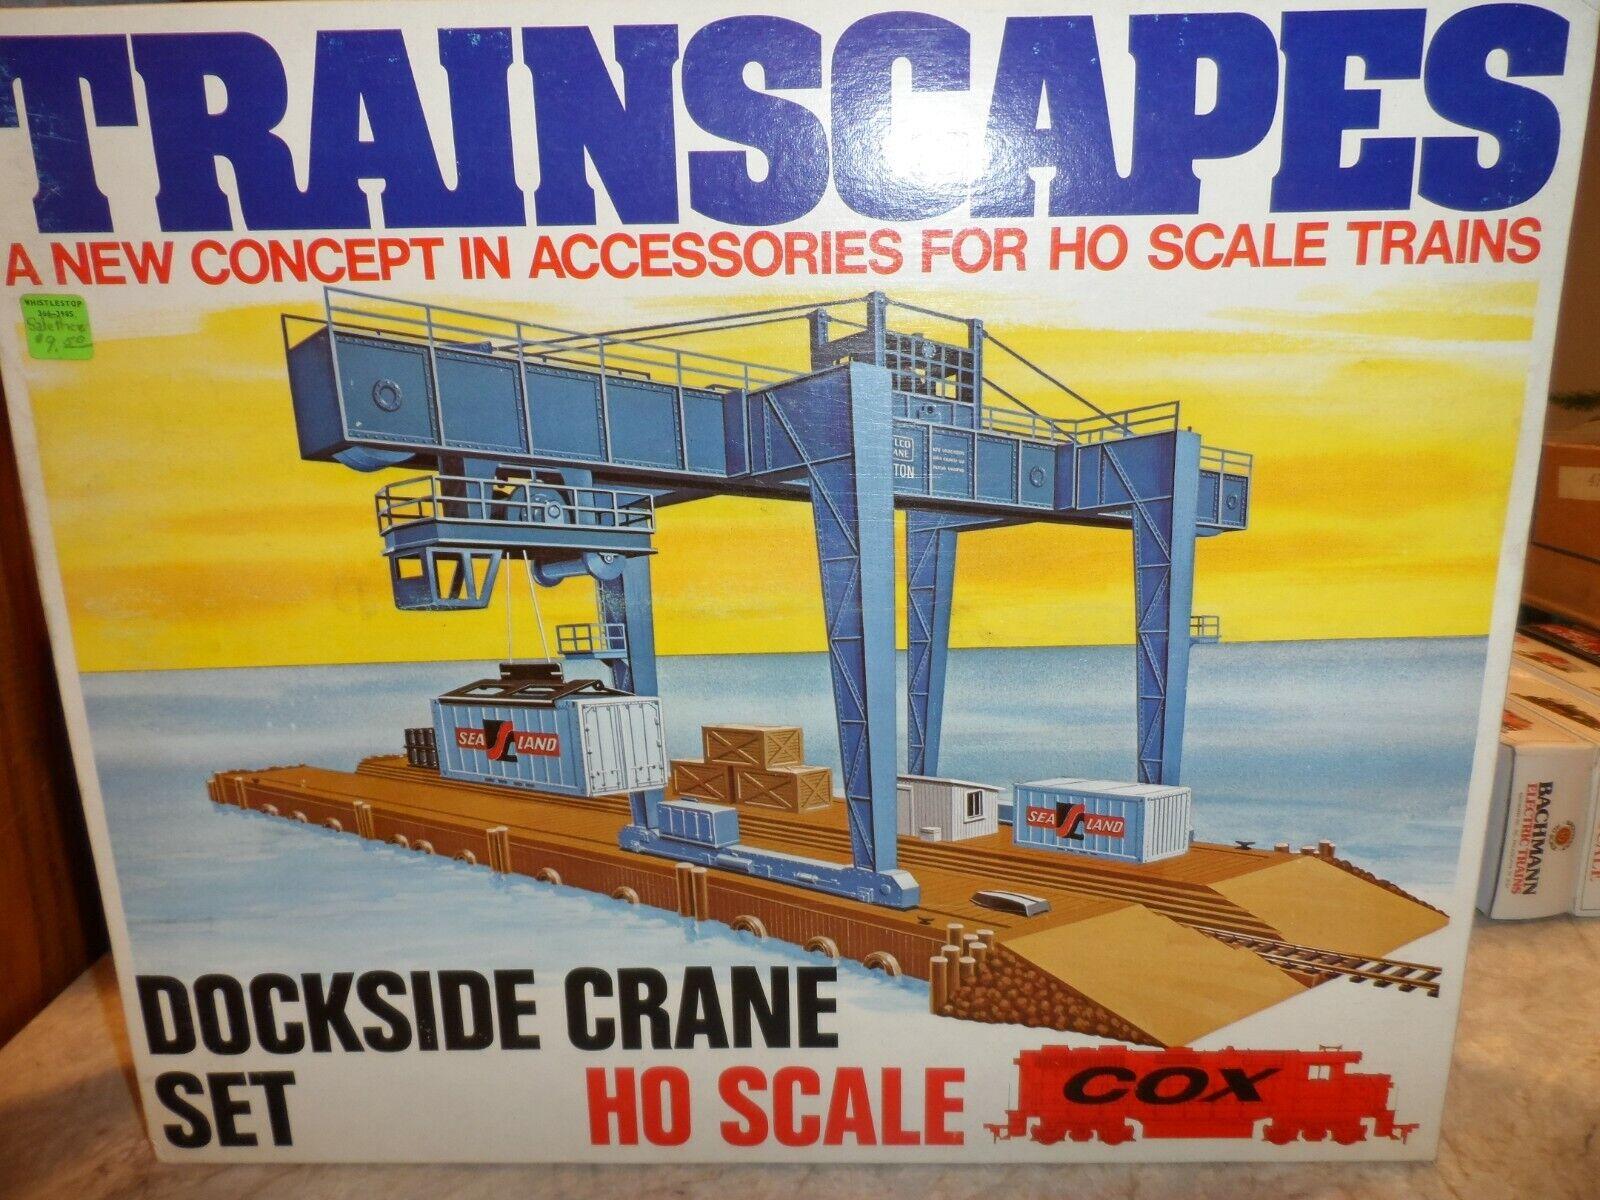 COX scala HO treno scapes Dock lato Crane Set N.I.B.